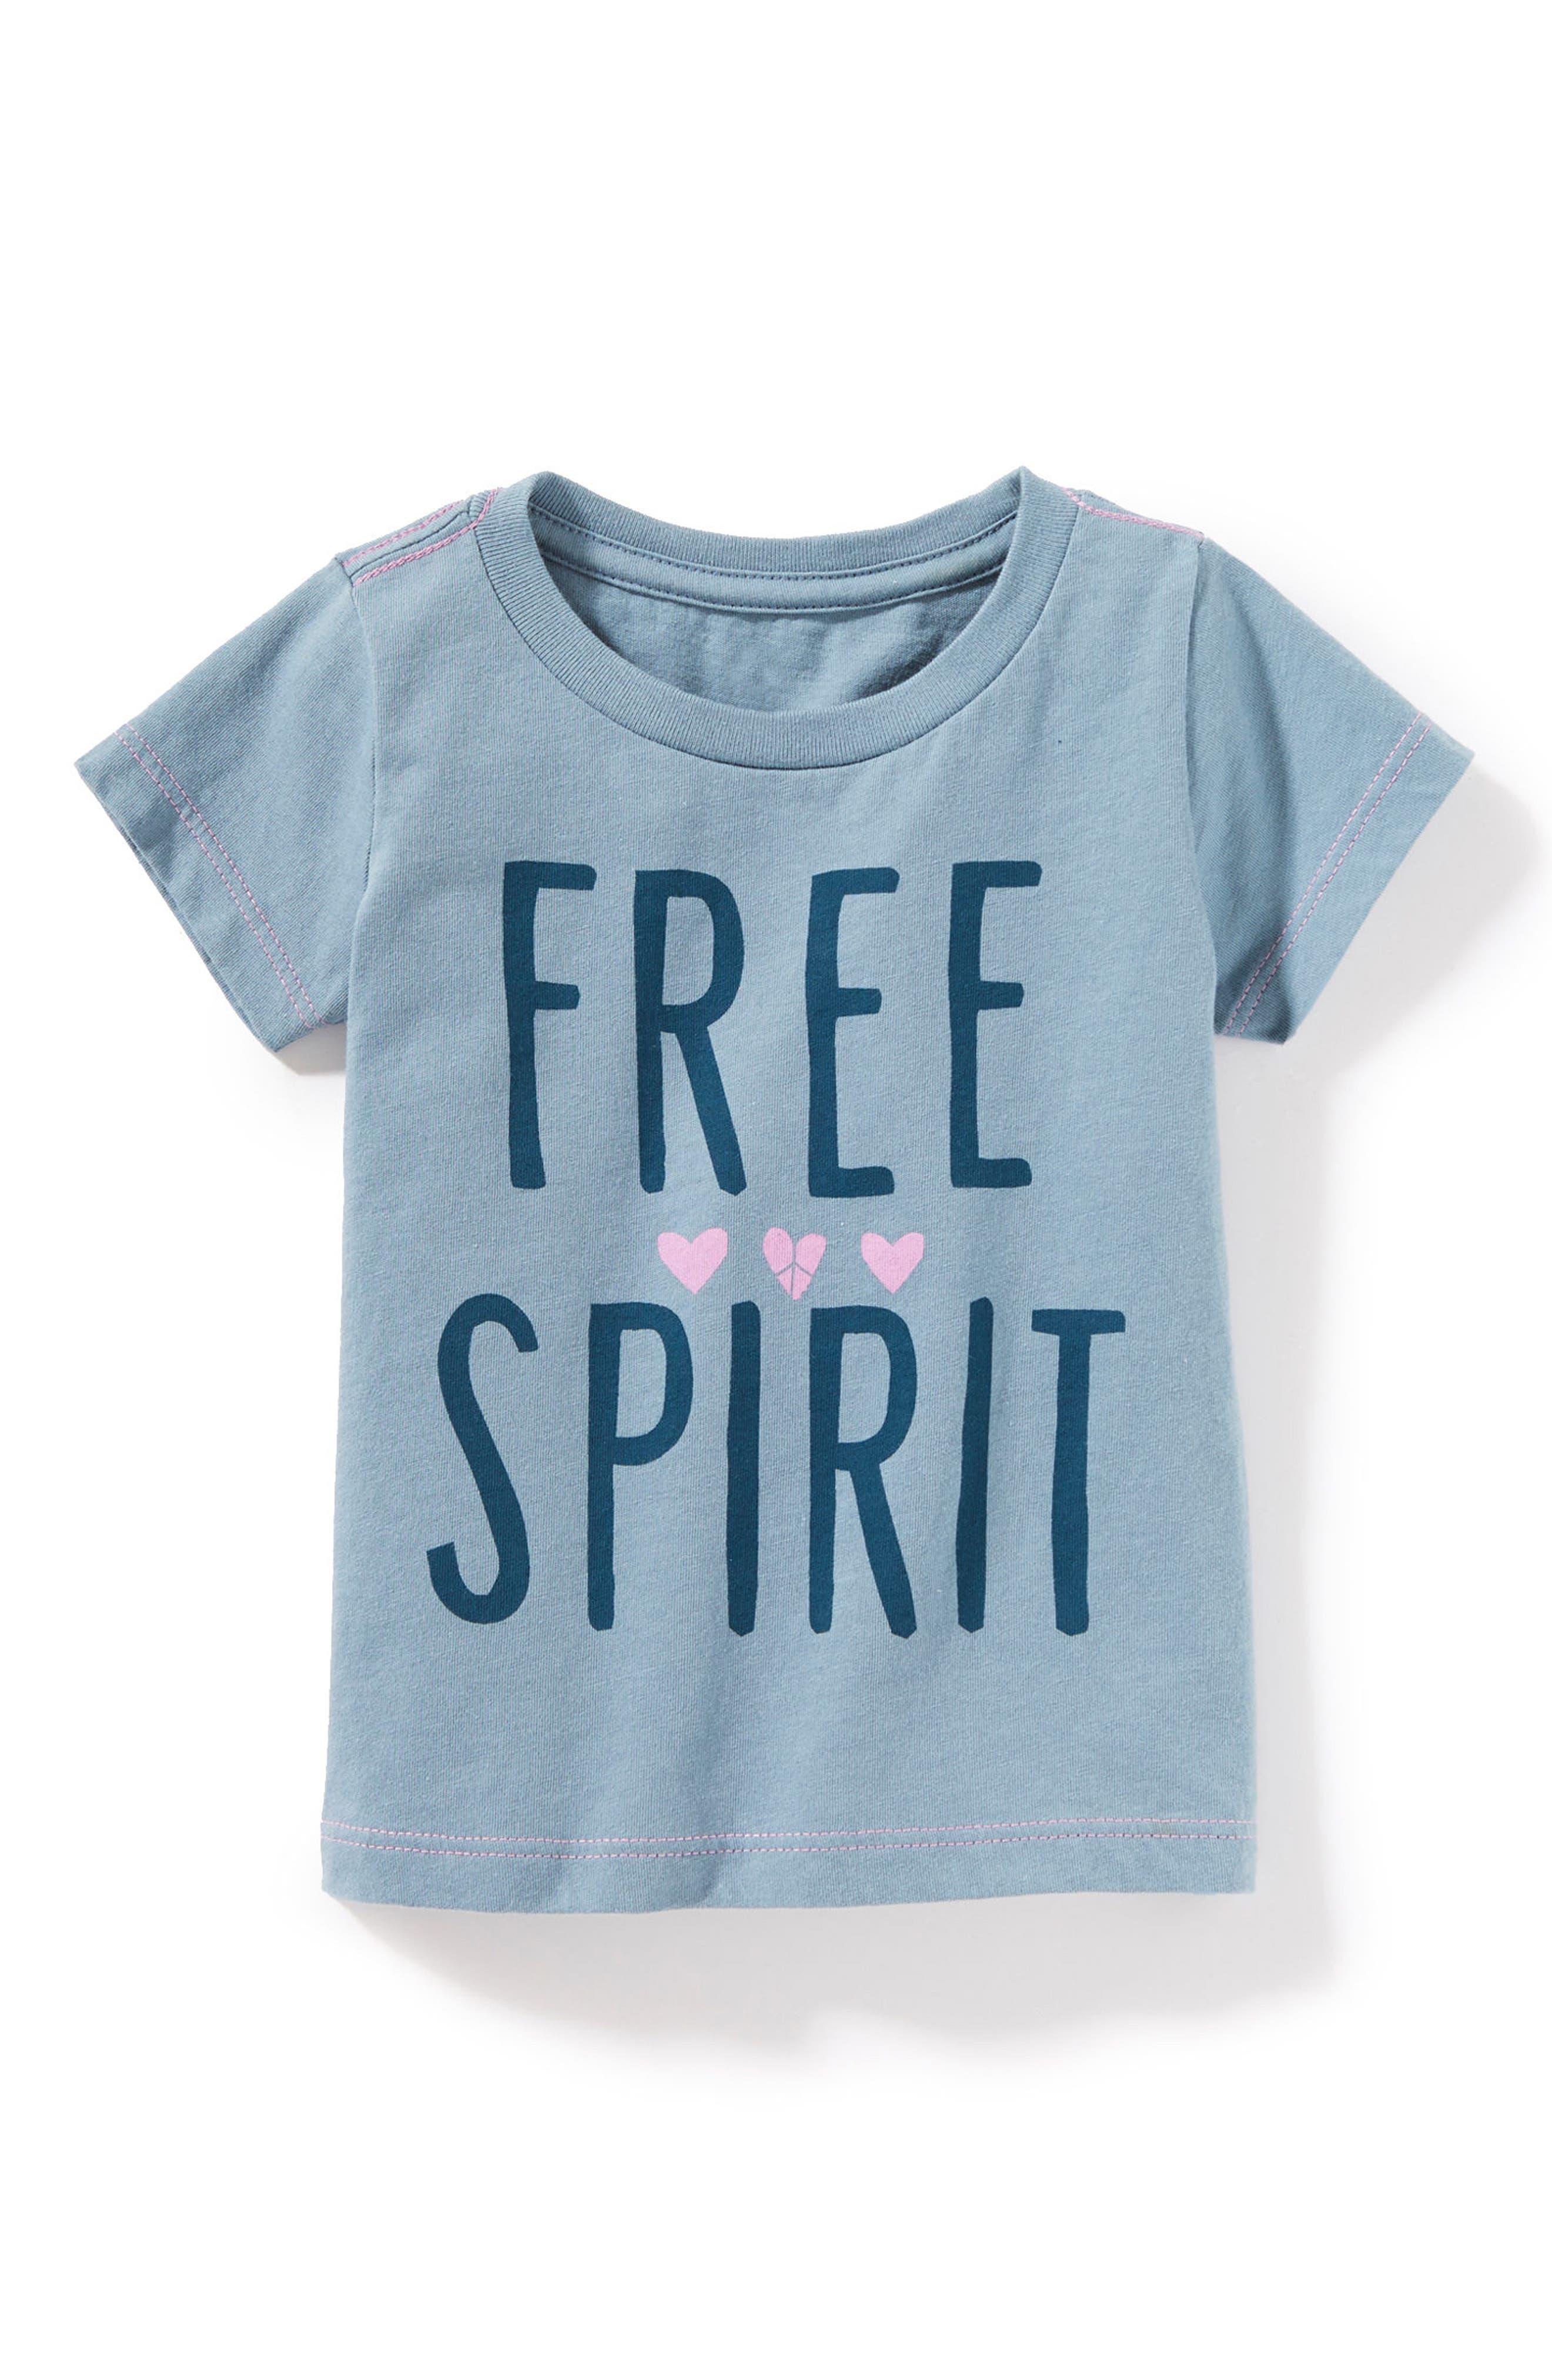 Peek Free Spirit Graphic Tee,                         Main,                         color, Steel Blue